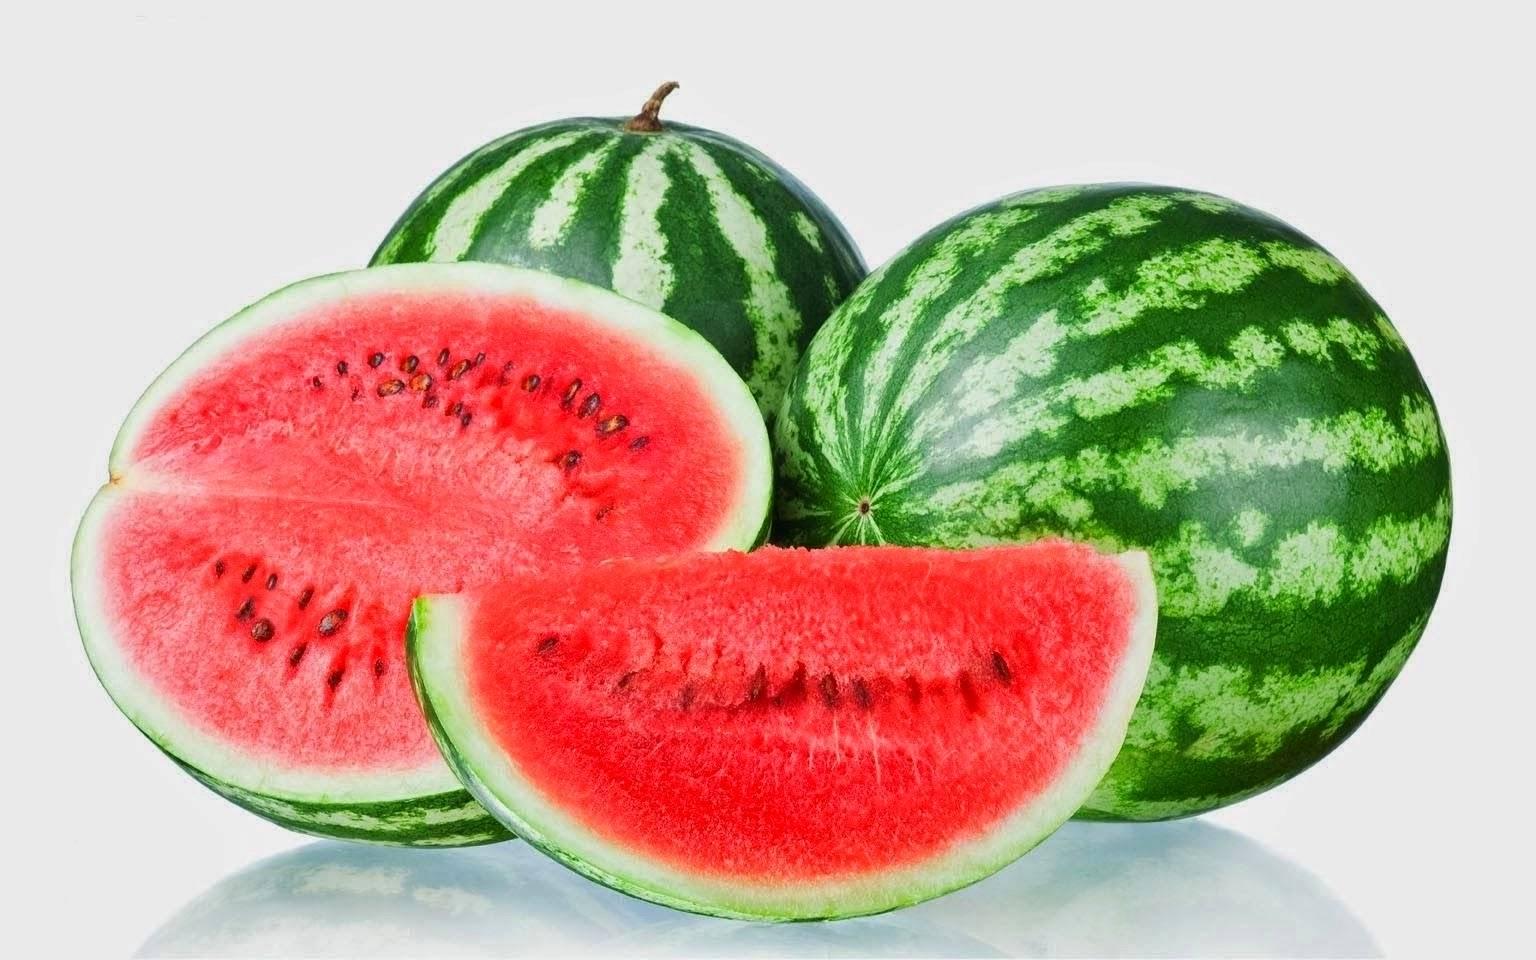 buah semangka merah